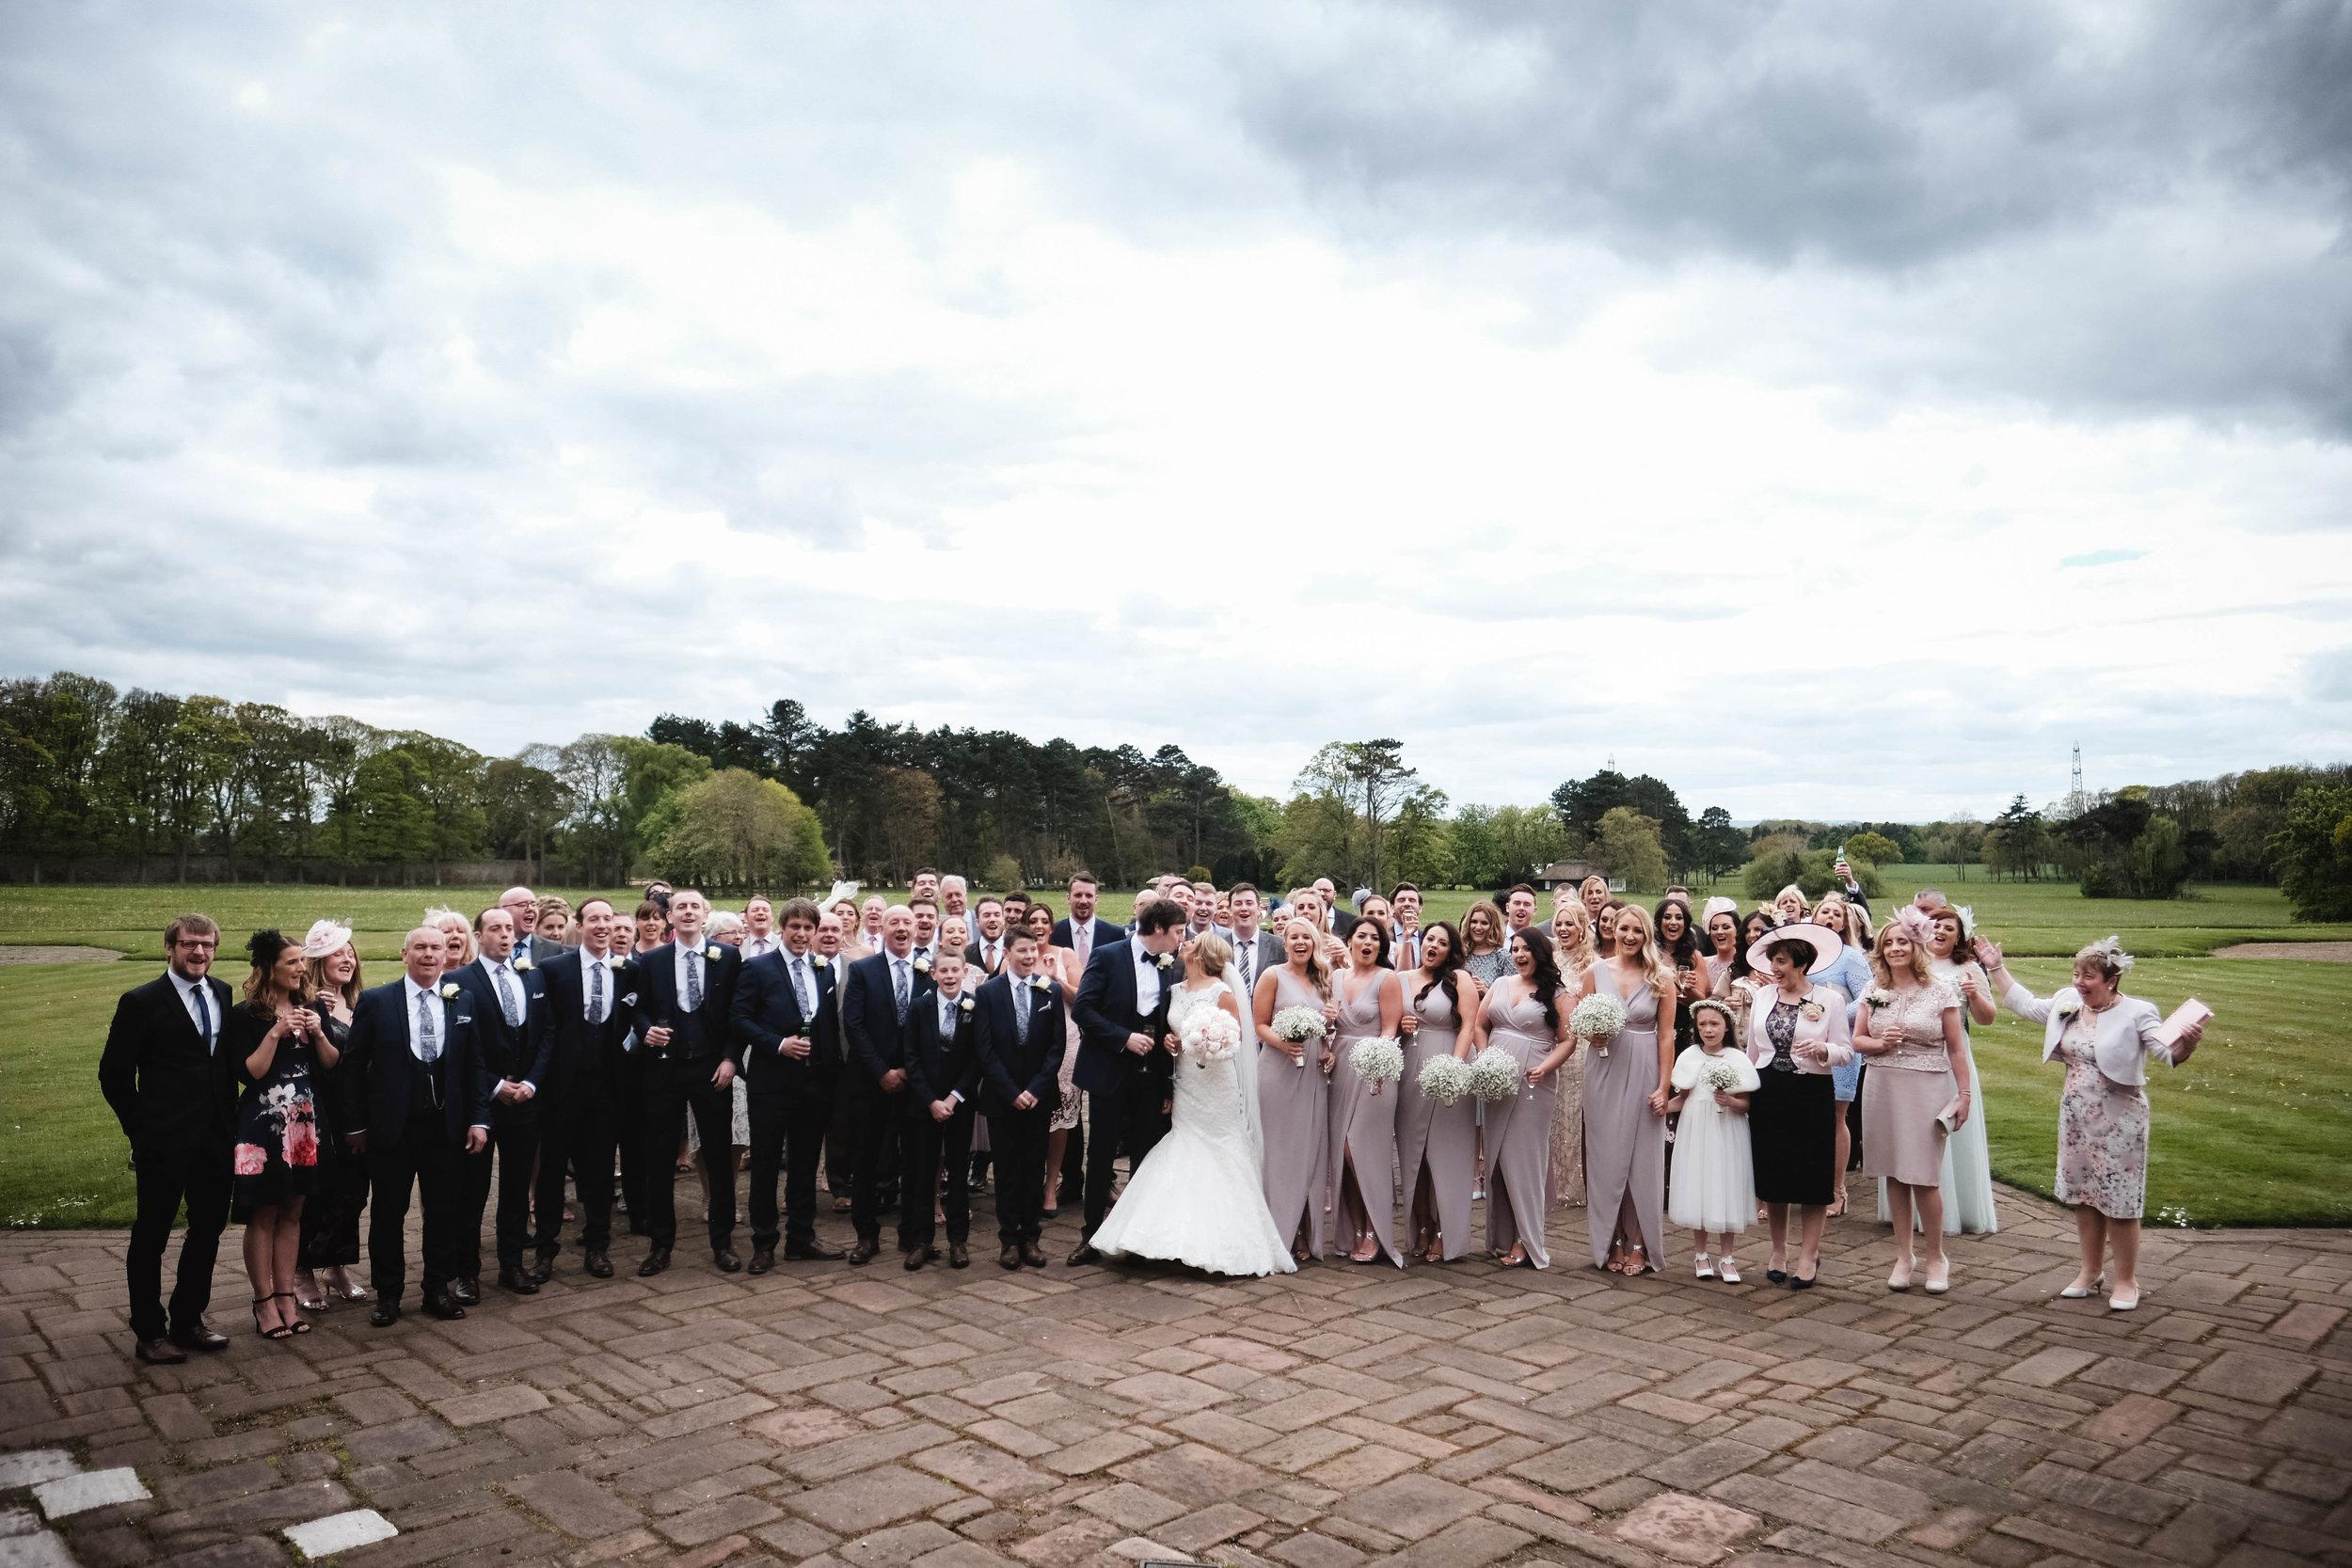 Thornton manor wedding photography cheshire wedding photographer liverpool manchester warrington chester wirral wedding BLOG (46 of 108).jpg